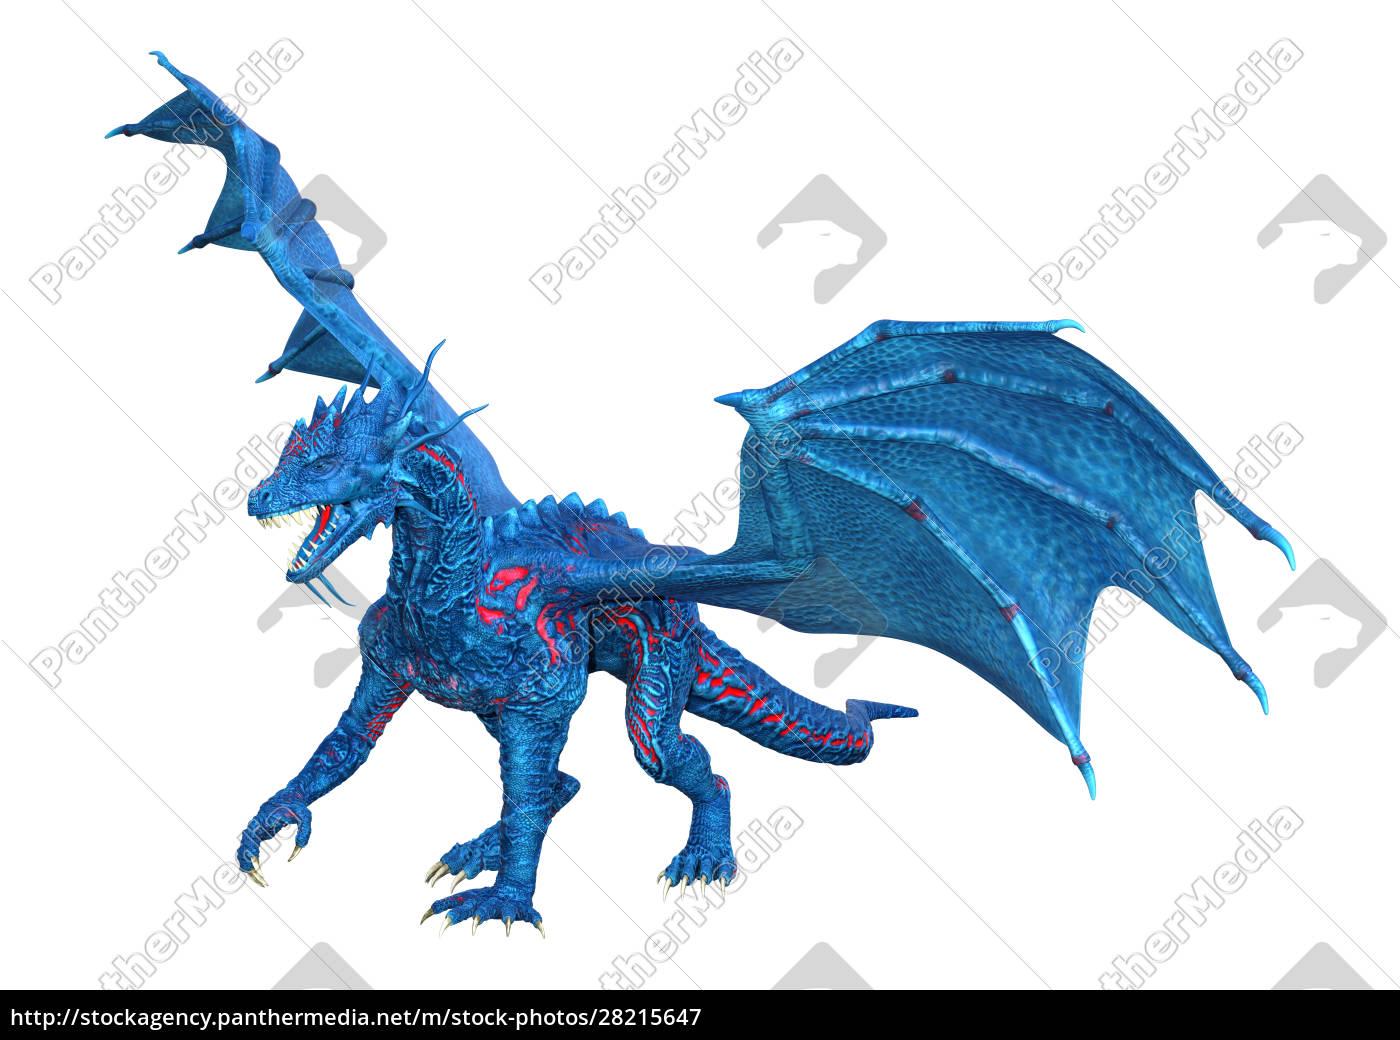 3d, rendering, fairy, tale, dragon, on - 28215647